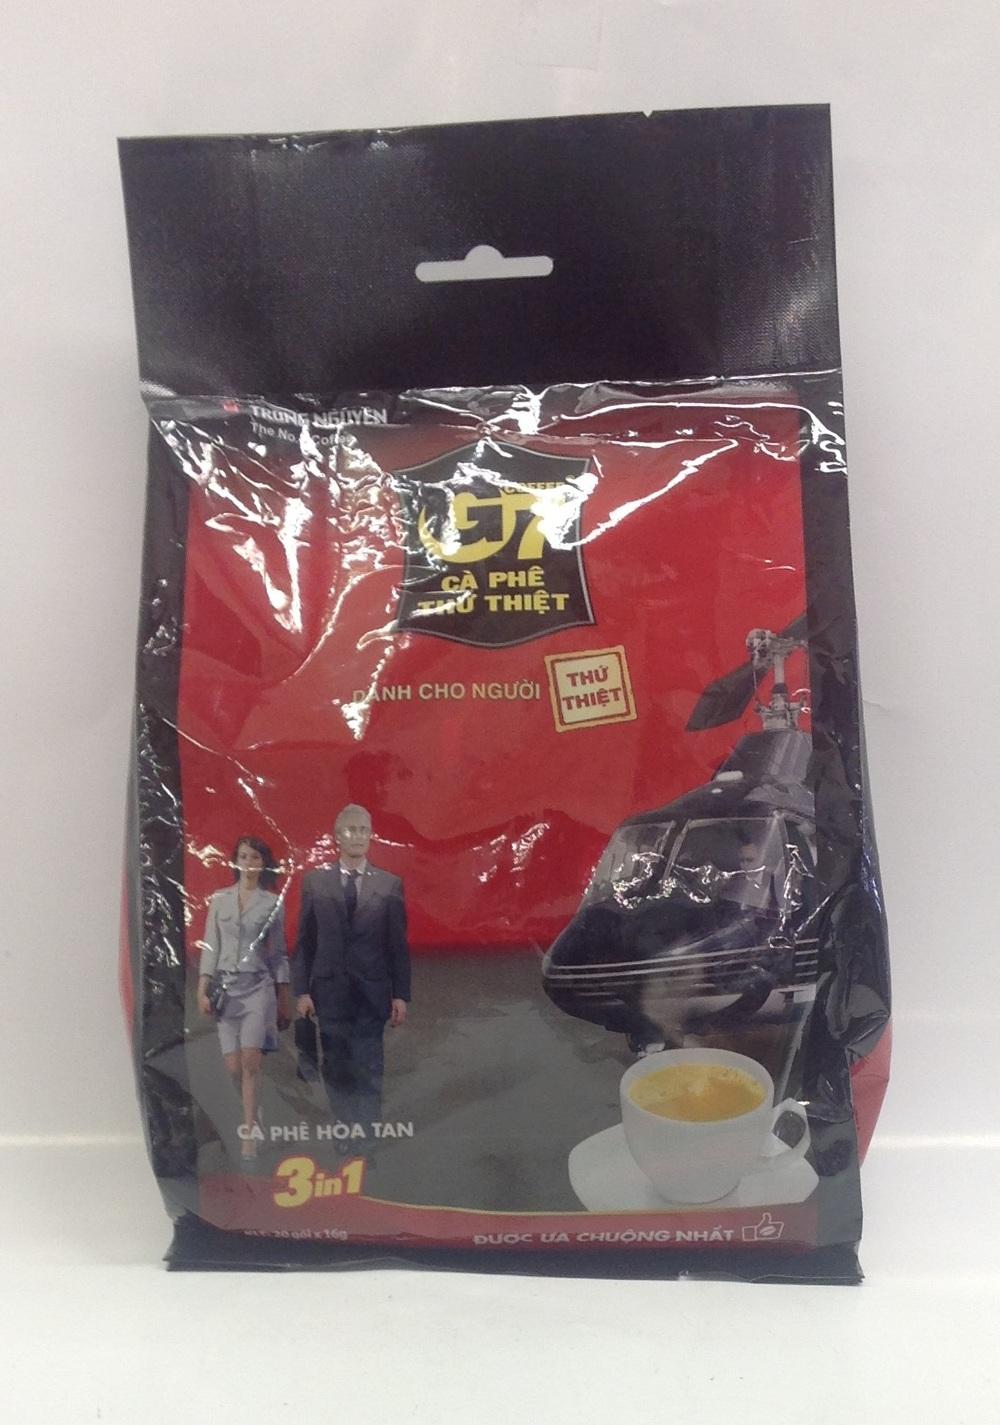 Coffee 3 in 1, Trung Nguyen   G7   DKT1359 24x24x16 g